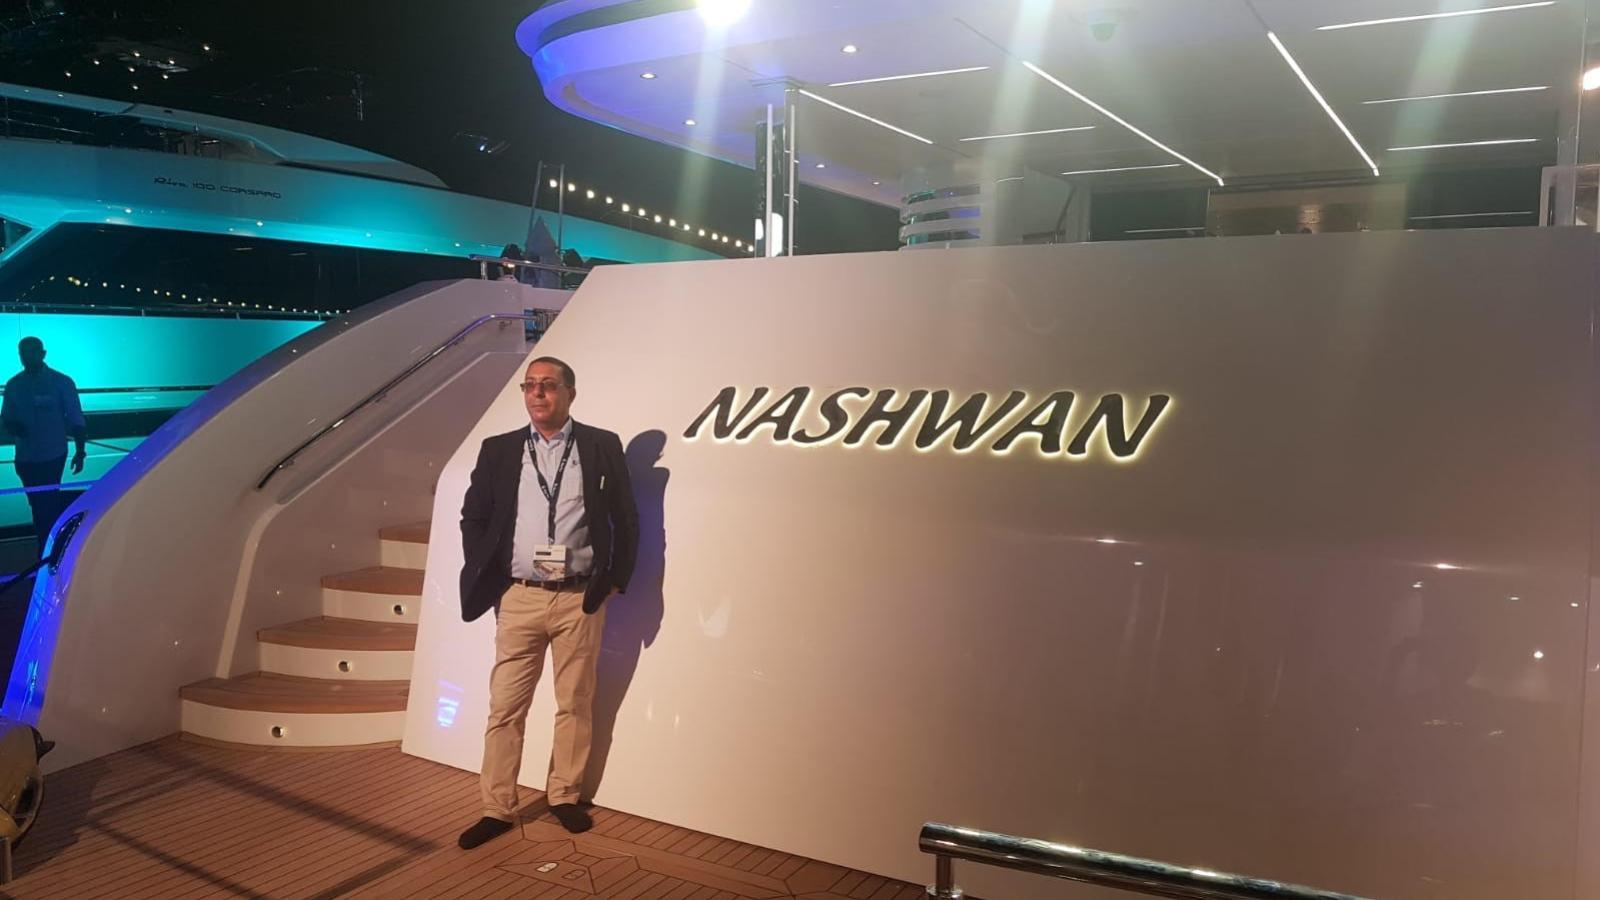 nashwan motoryacht gulf craft majesty 140 43m 2019 christening